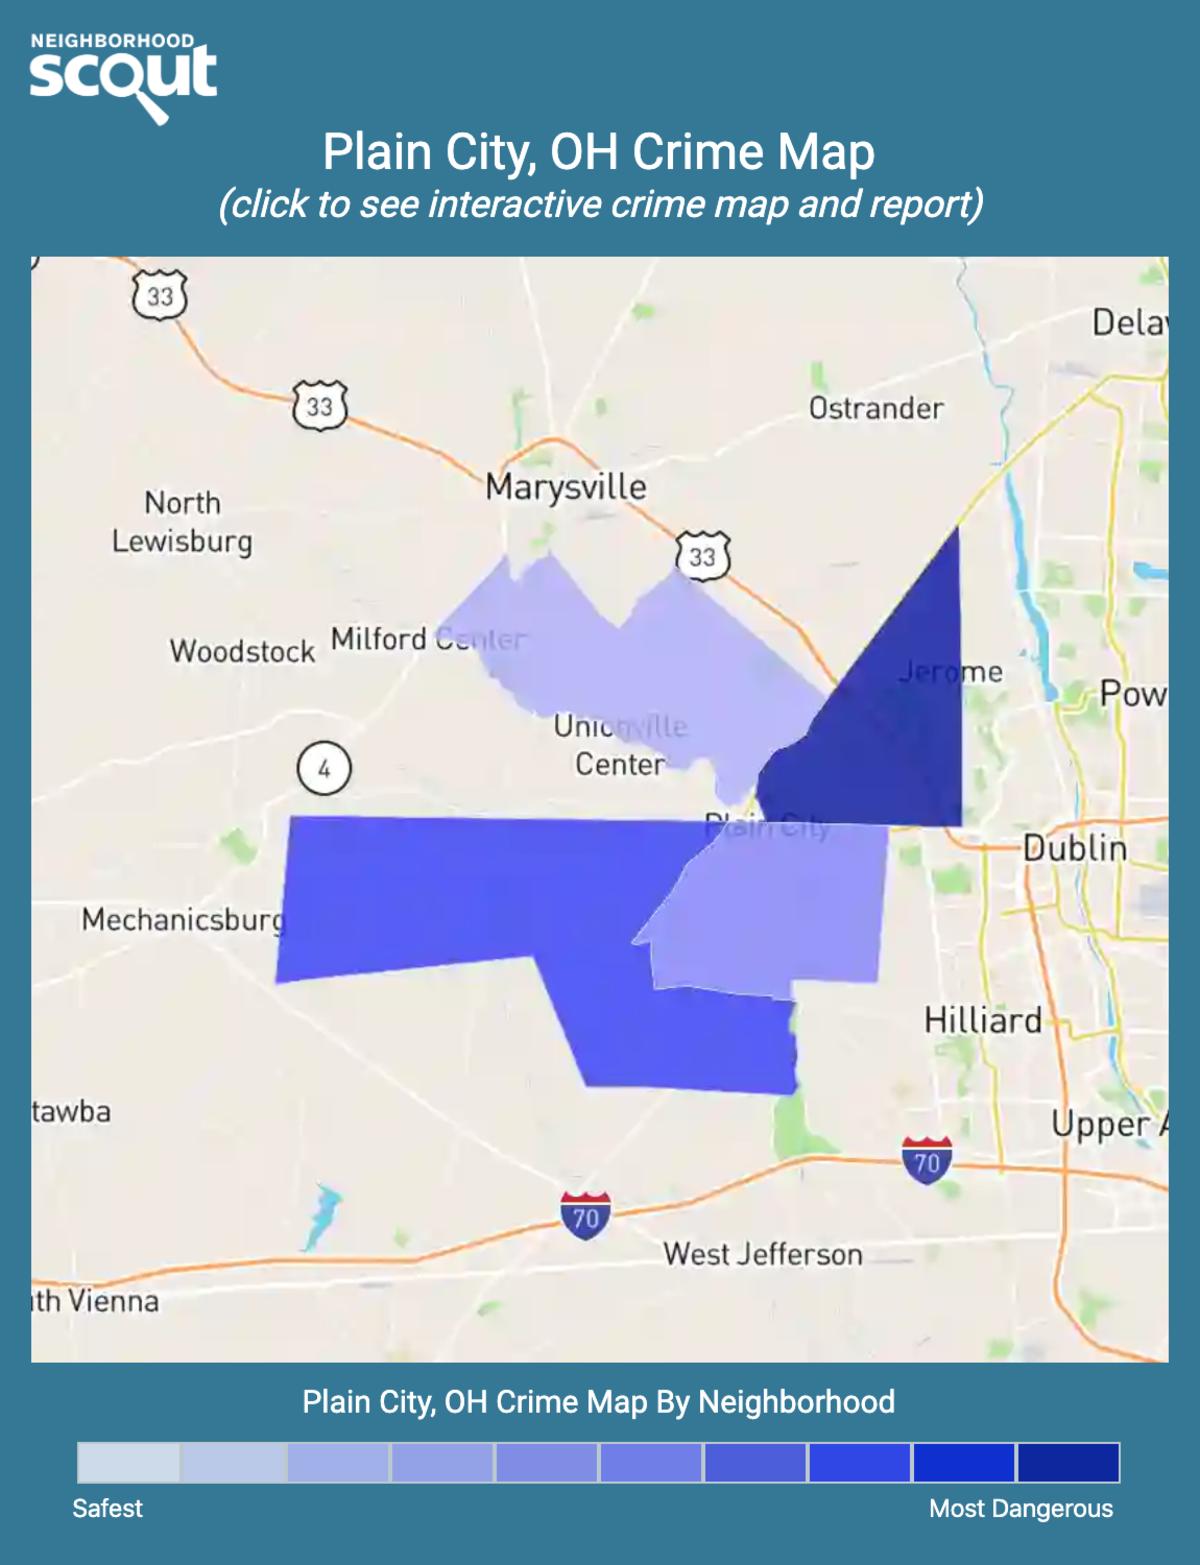 Plain City, Ohio crime map